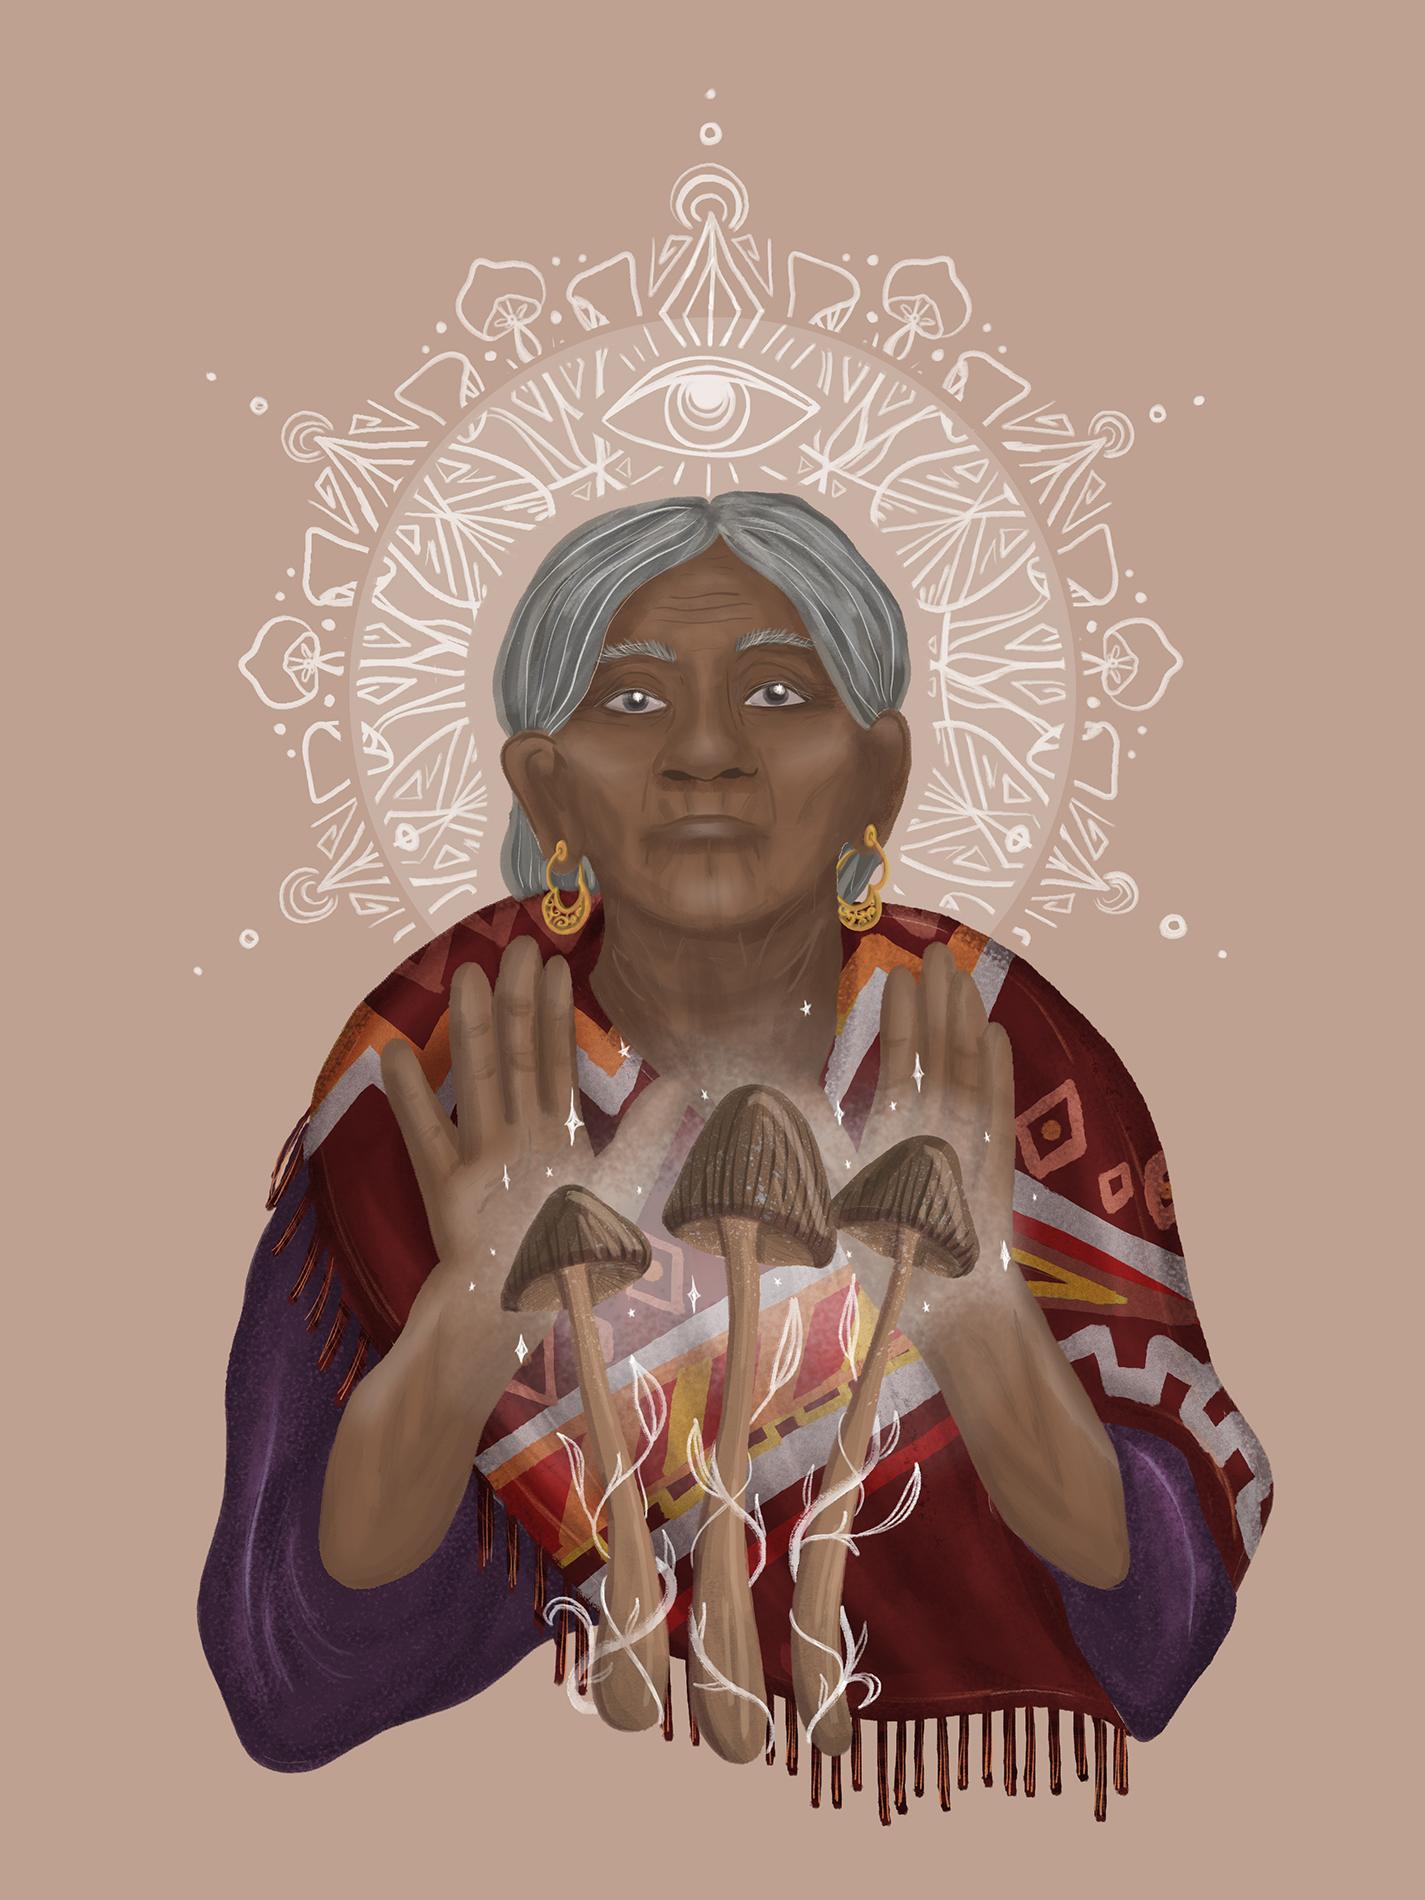 Illustration of the Mexican magic mushroom shaman Maria Sabina